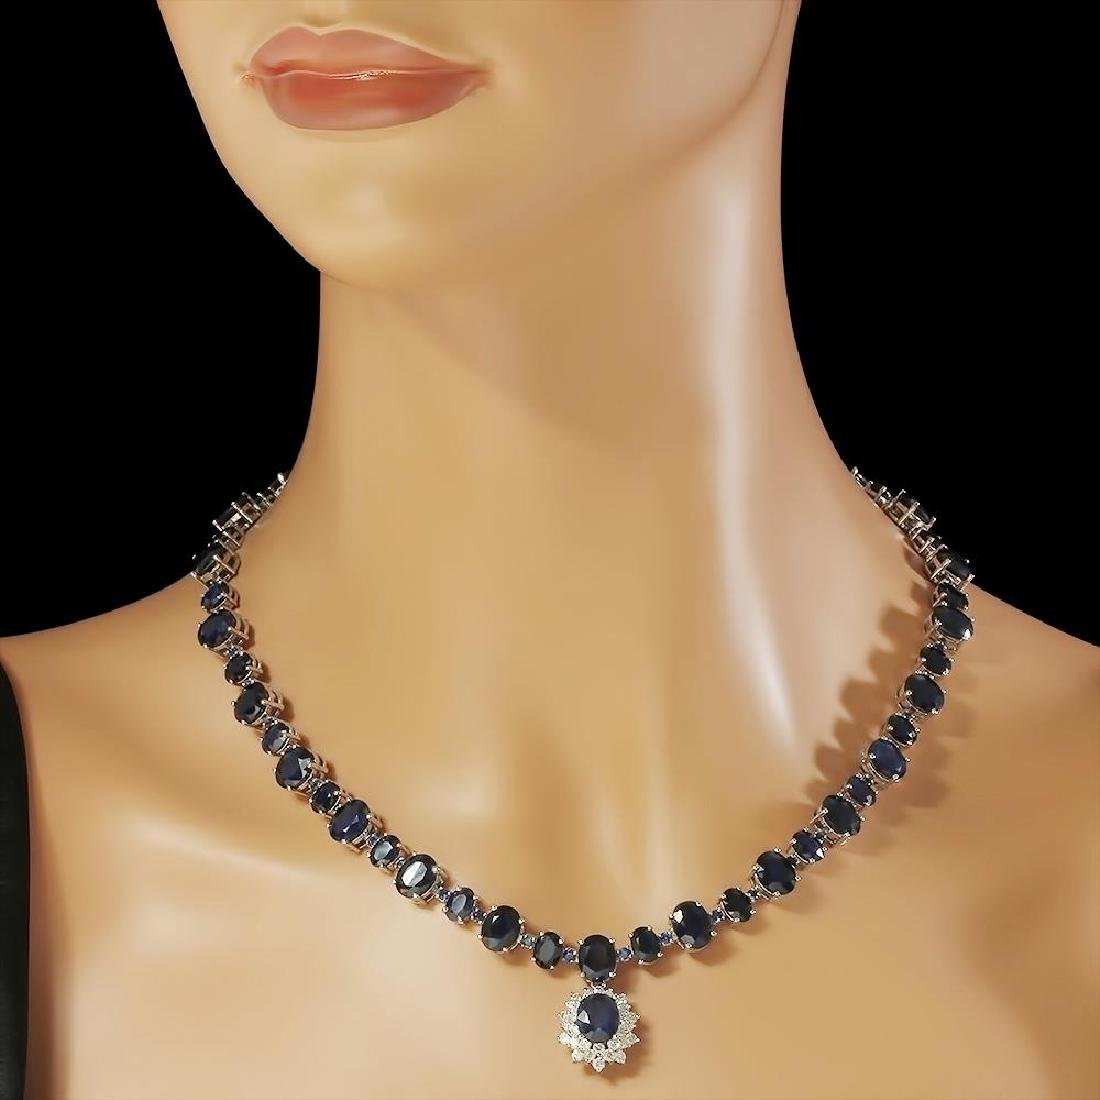 14K Gold 49.50ct Sapphire 1.70ct Diamond Necklace - 3